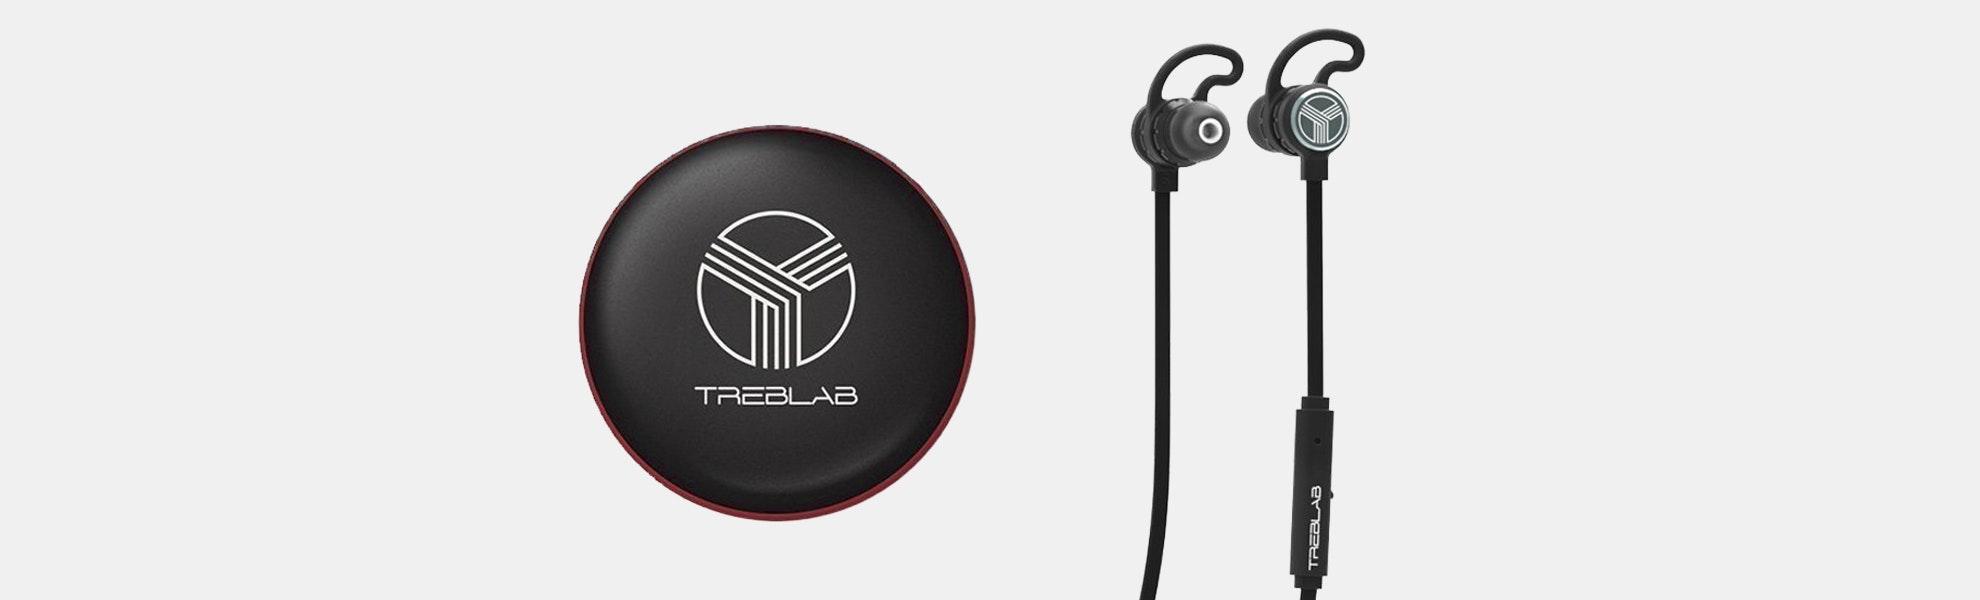 Treblab J1 IPX6 Bluetooth Earbuds